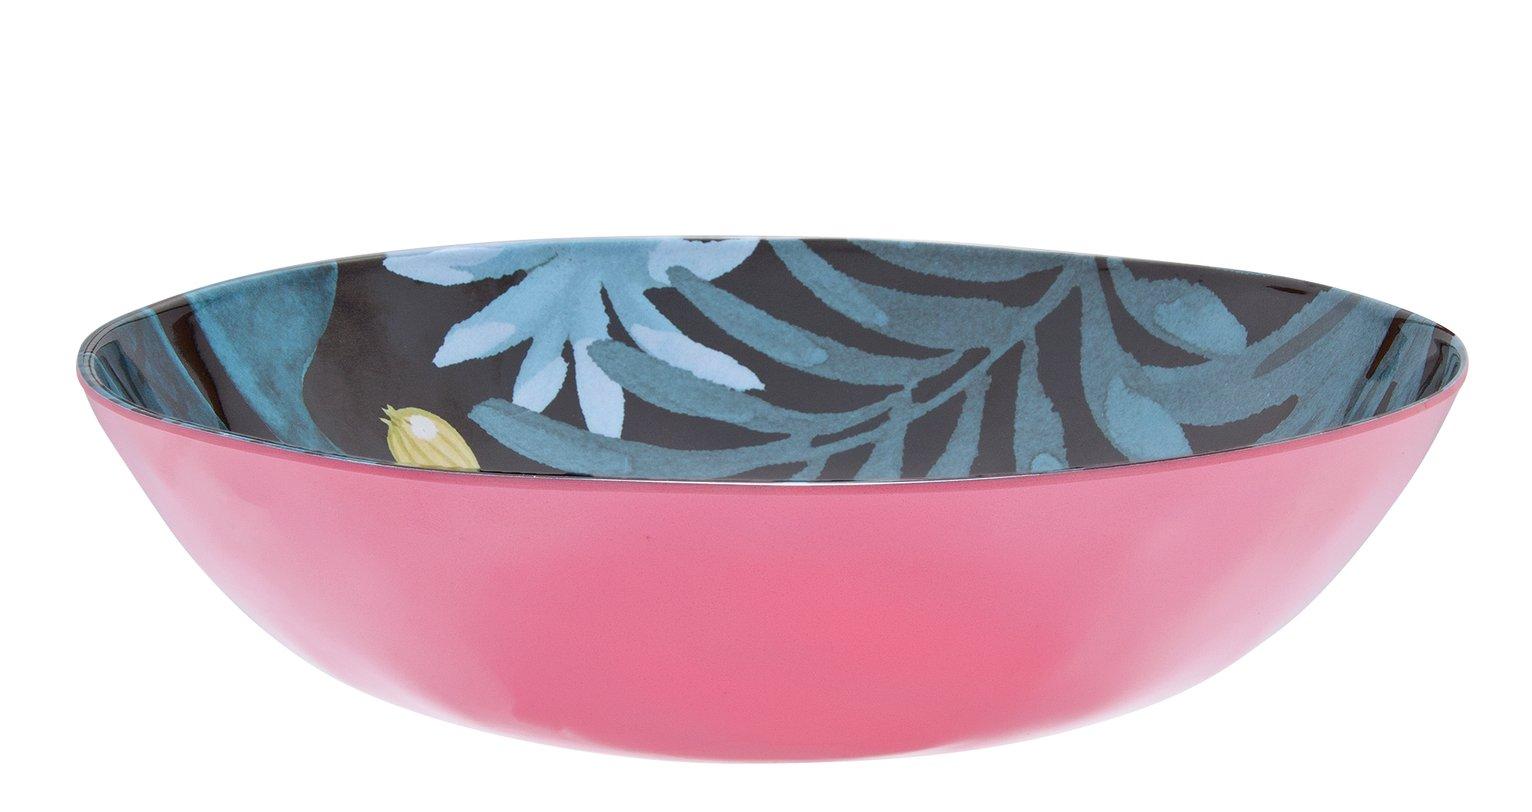 Argos Home Rainforest Pasta Bowl - 4 Pack